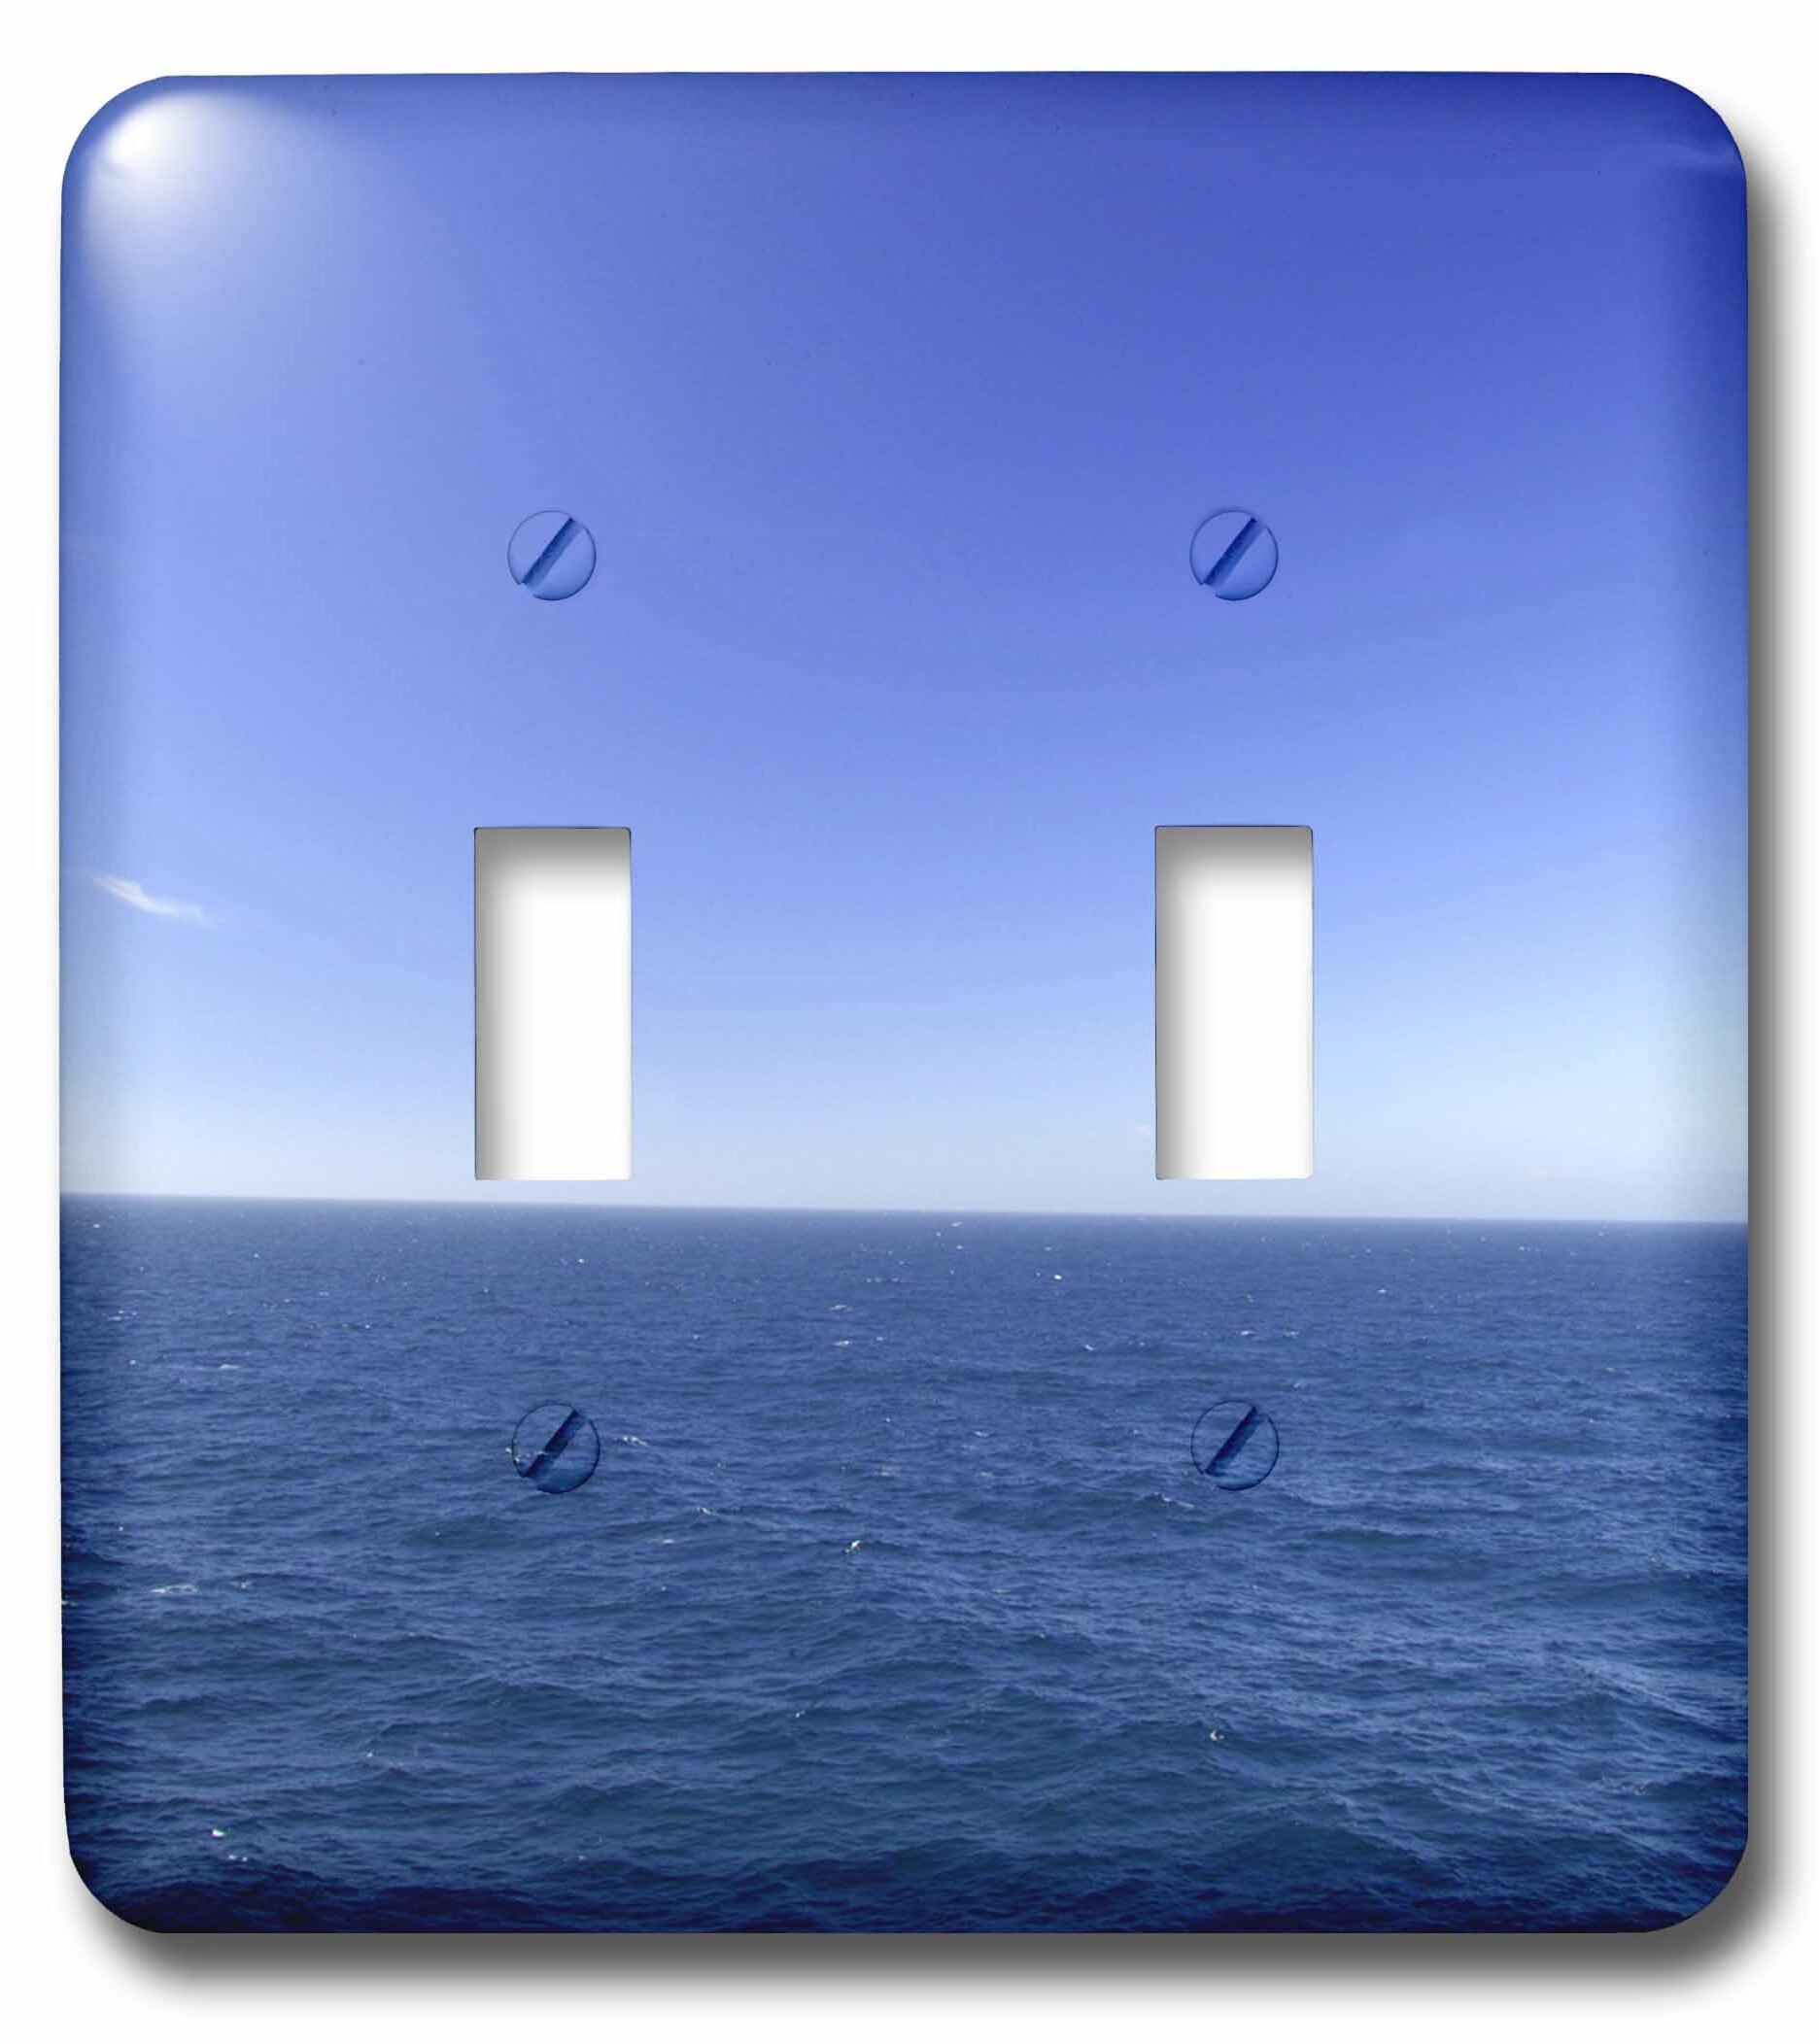 3drose Pacific Ocean 2 Gang Toggle Light Switch Wall Plate Wayfair